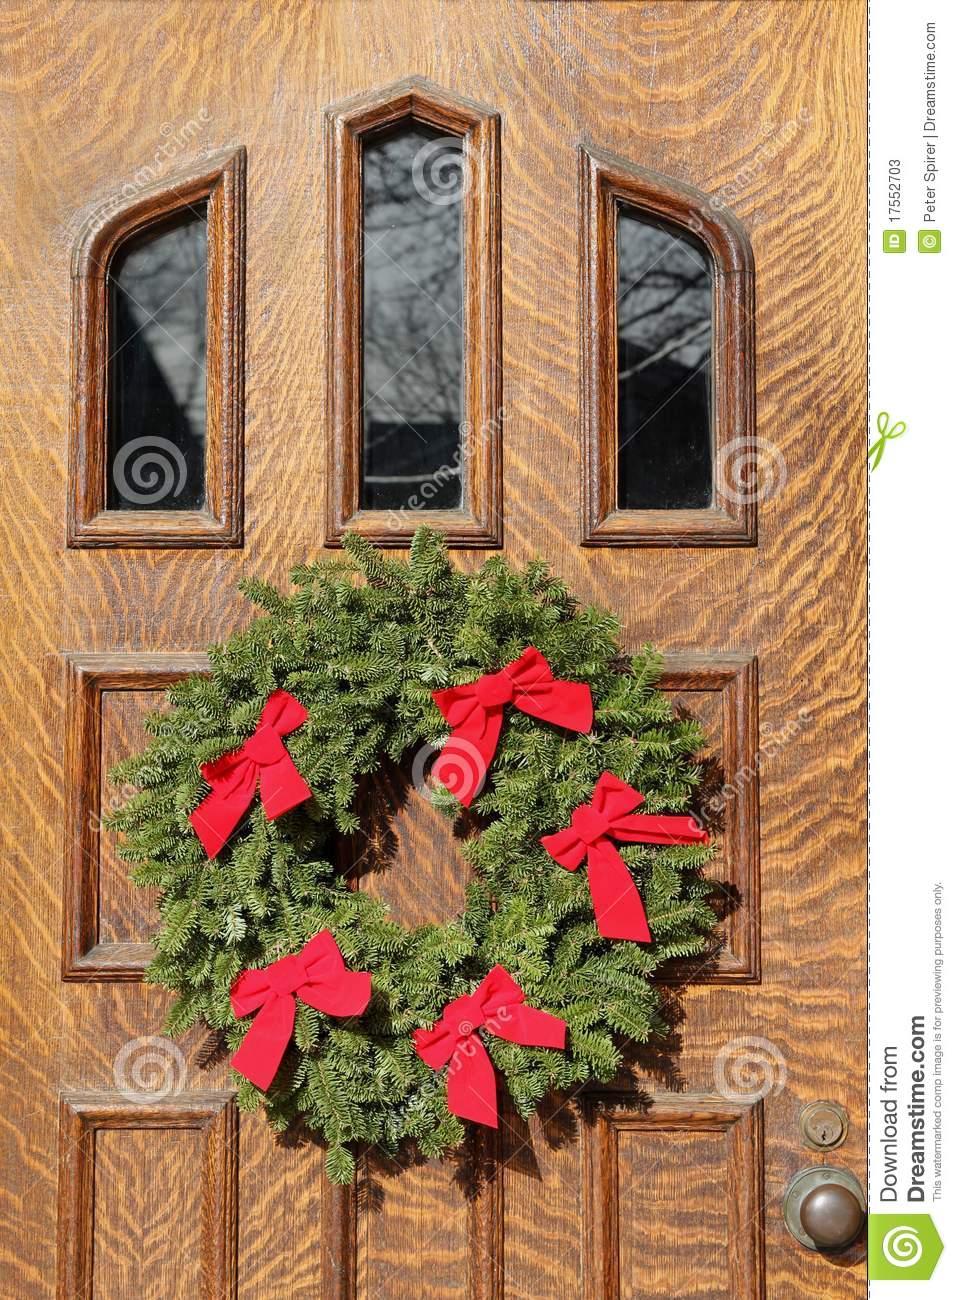 Christmas front door clipart jpg royalty free library Christmas Front Door Clipart Wwwgalleryhipcom The, Door Christmas ... jpg royalty free library